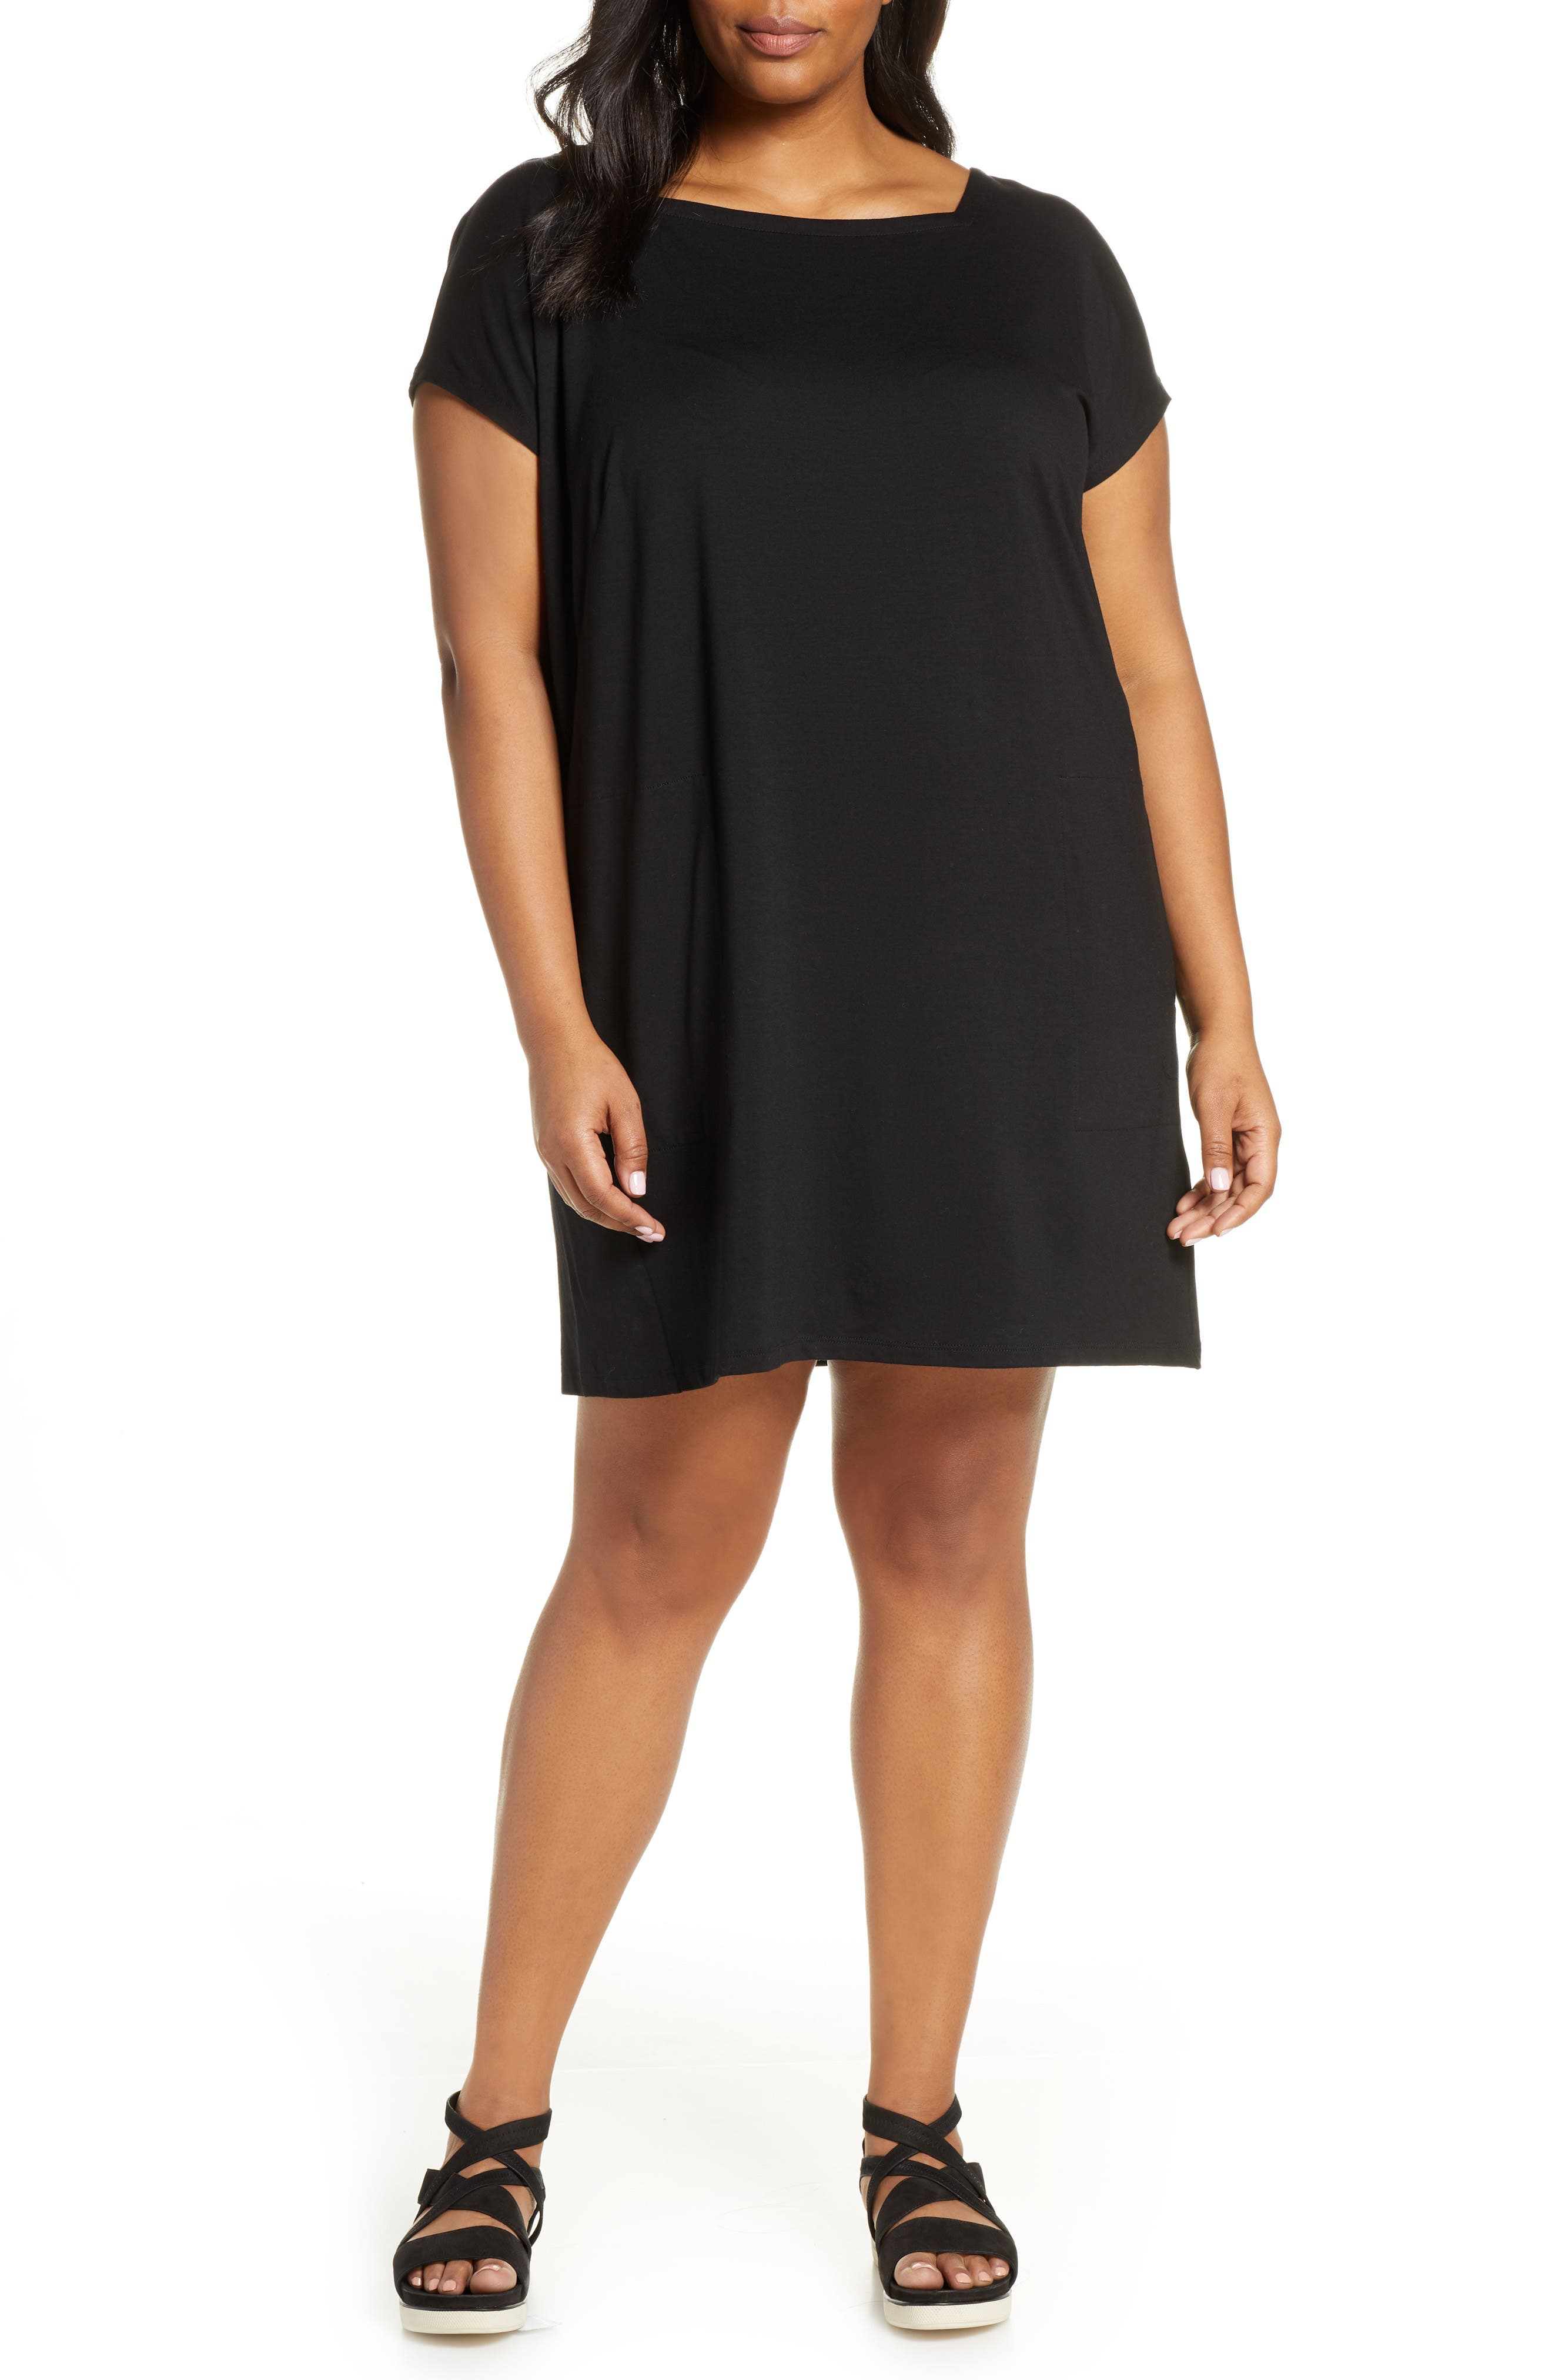 Plus Size Eileen Fisher Square Neck Tencel Lyocell Blend Dress, Black